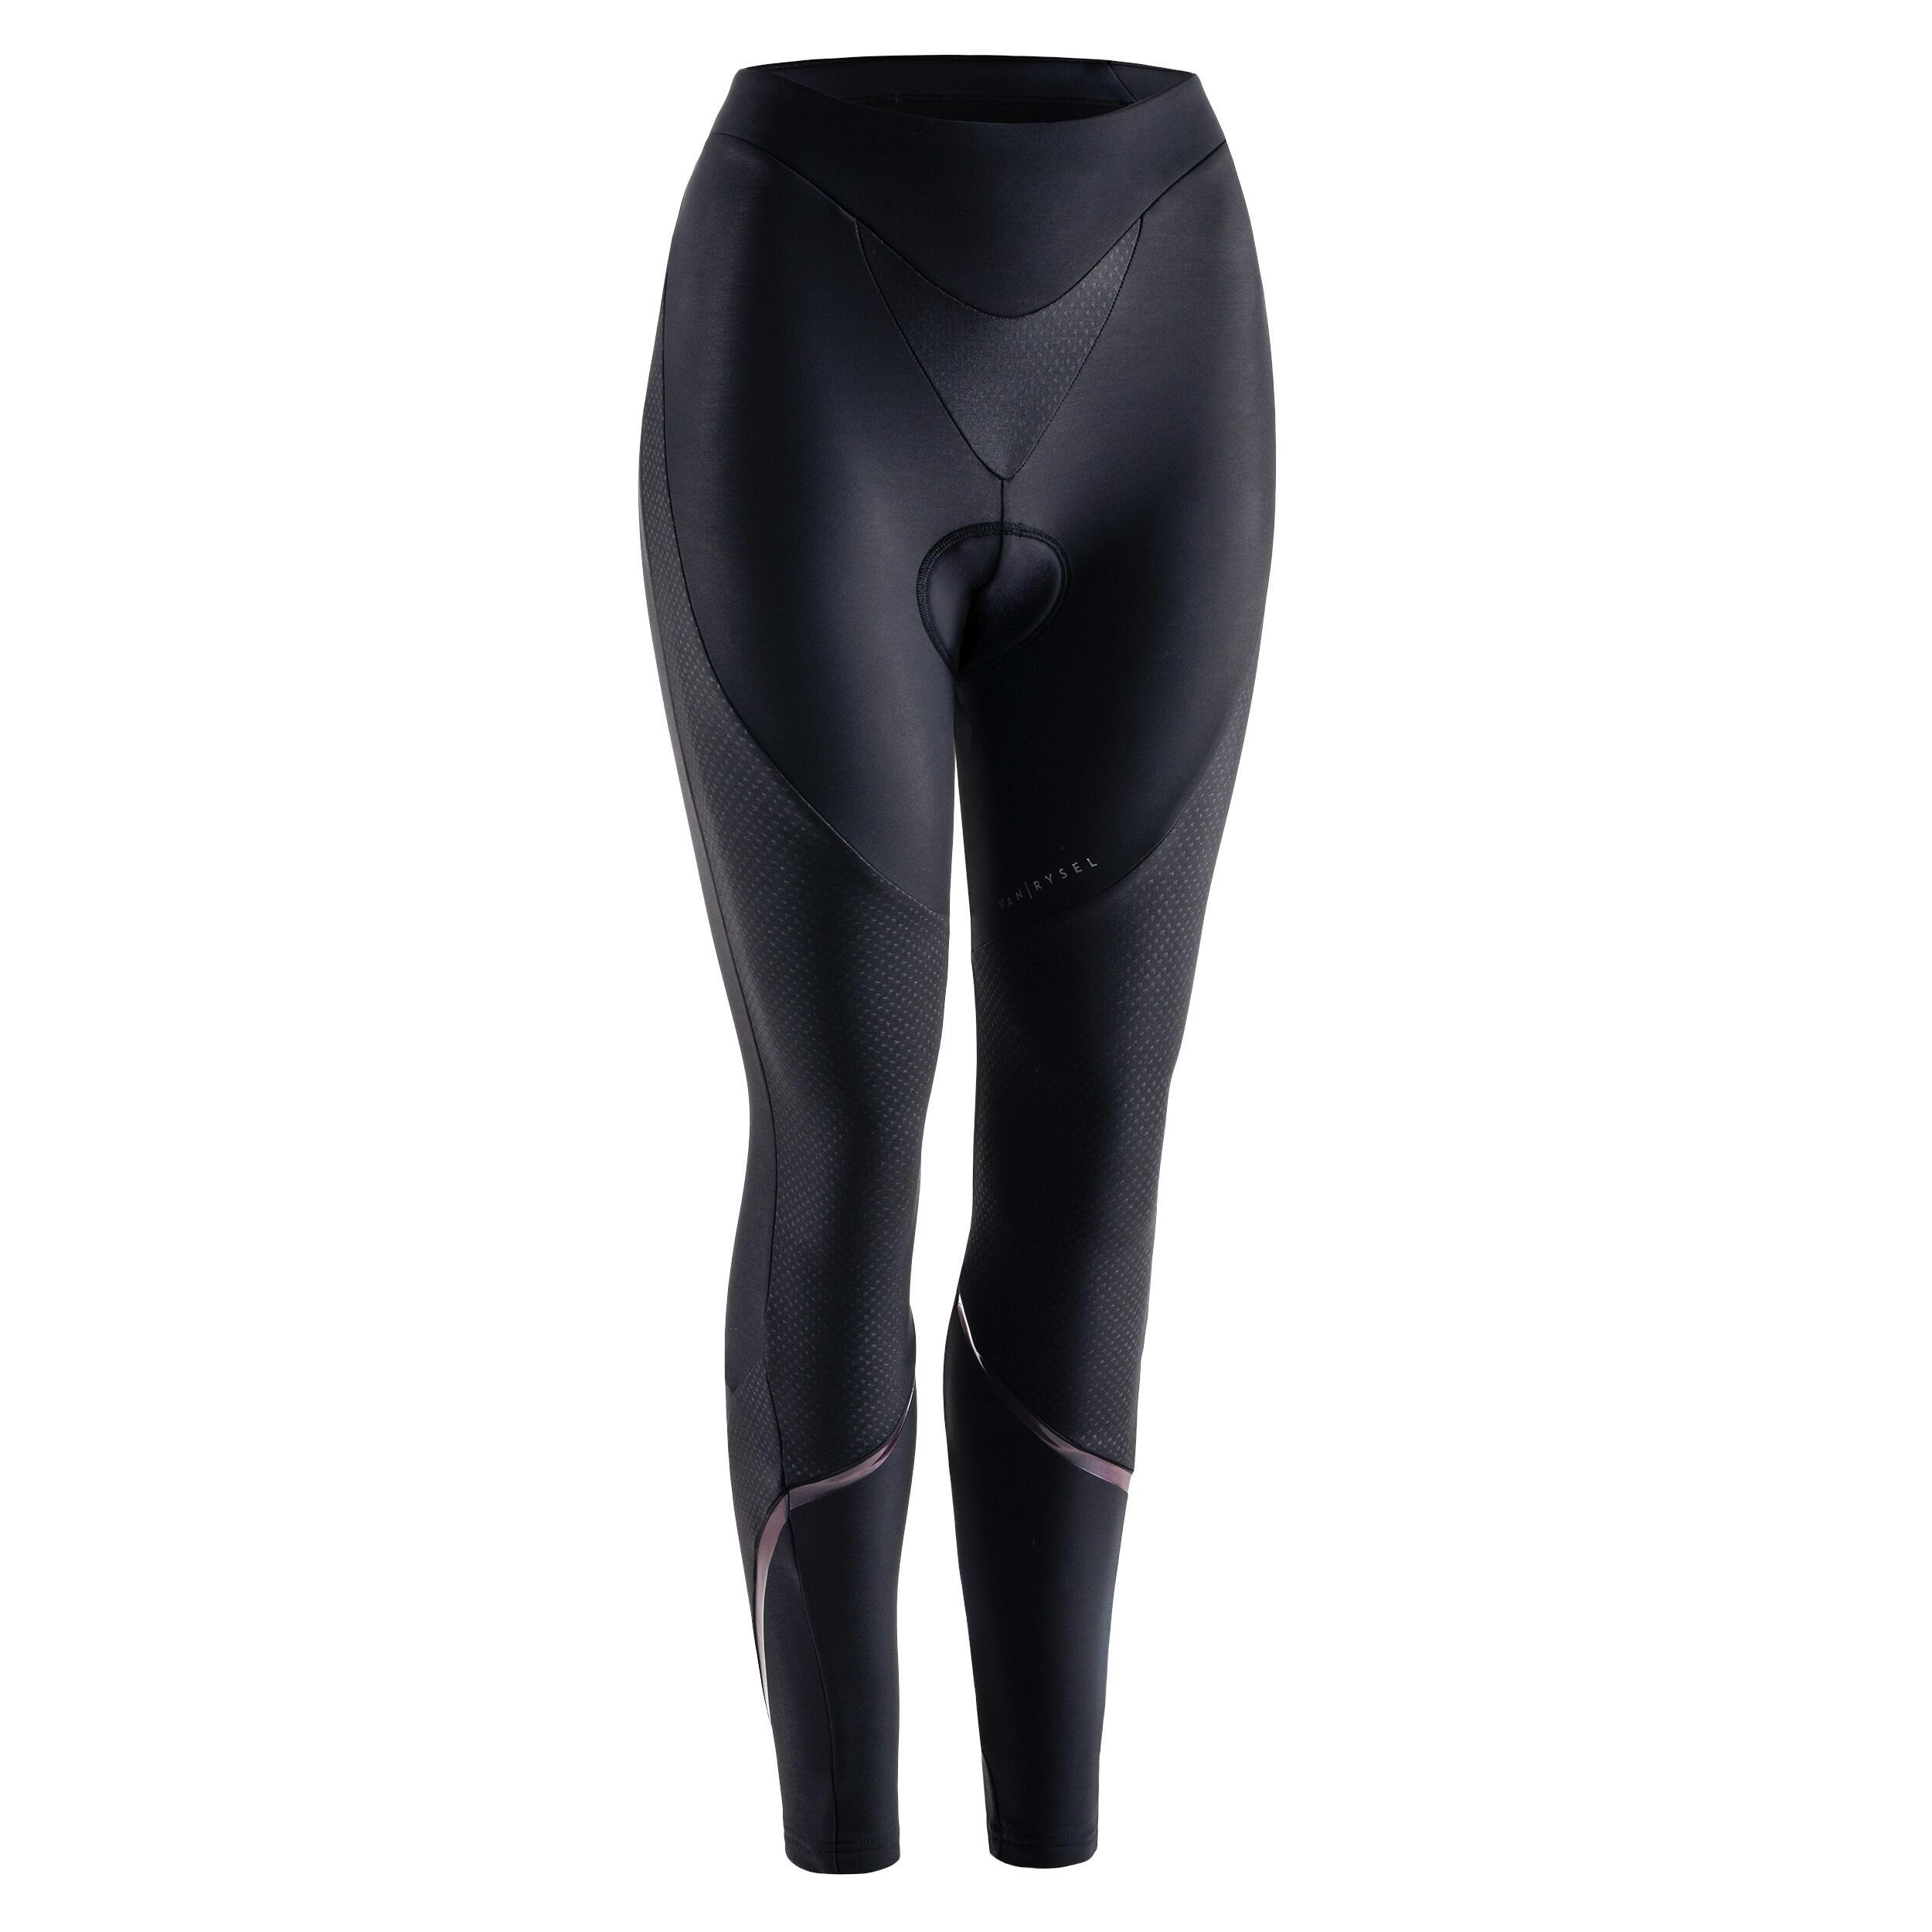 Radhose lang kaltes Wetter Damen schwarz | Sportbekleidung > Sporthosen > Fahrradhosen | Van rysel